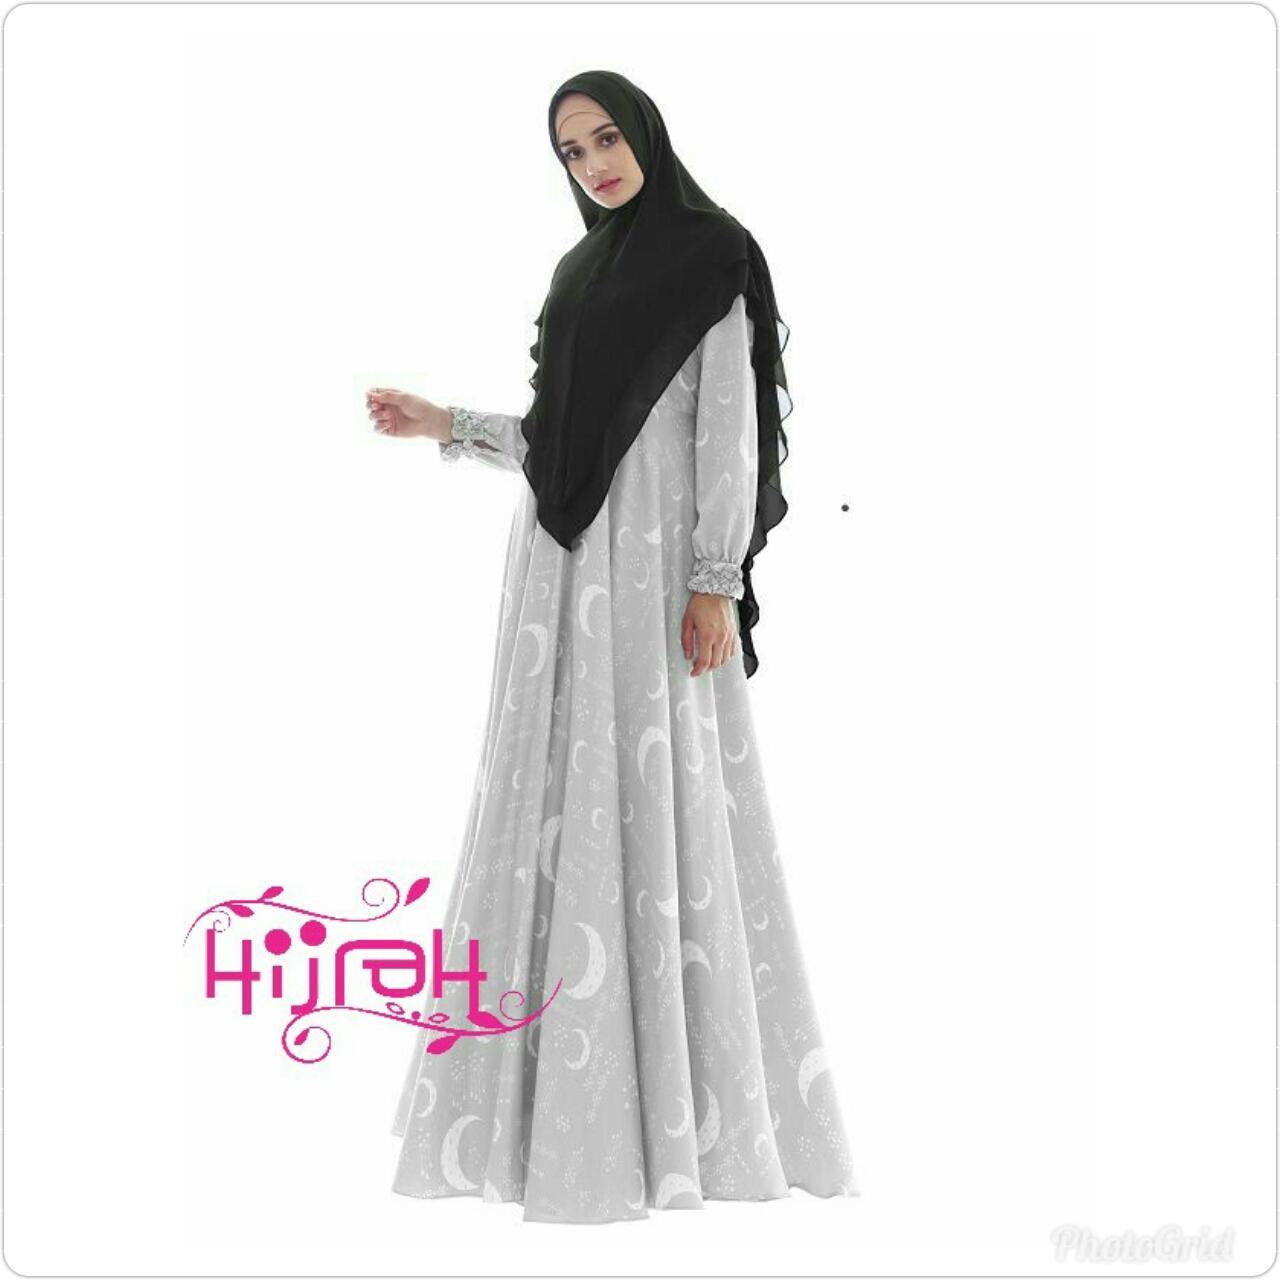 Gamis Syari Cantik Murah Elegan Abu Silver Daily Wear cocok Untuk Acara Santai